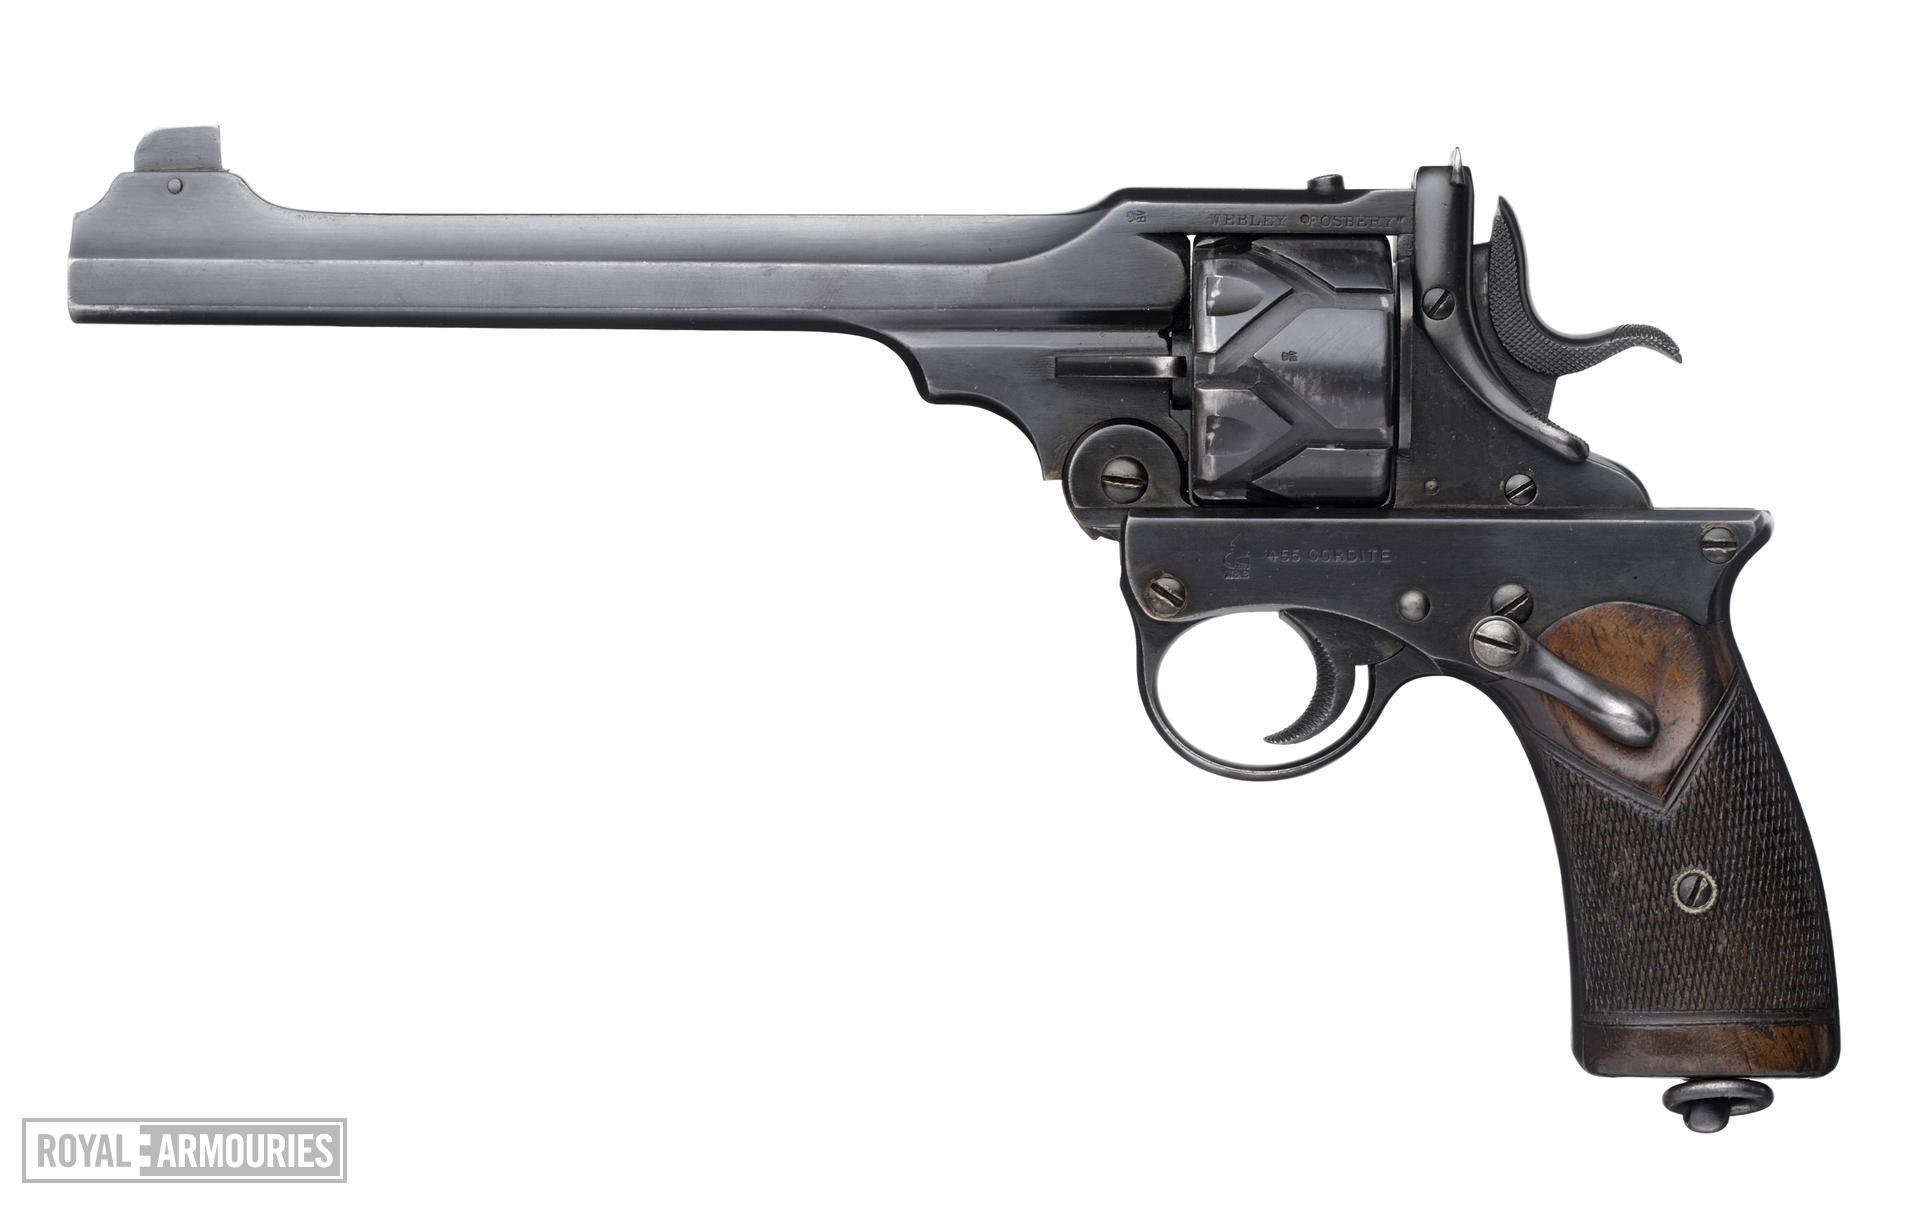 Centrefire six-shot self-cocking target revolver - Webley Fosbery Target Model